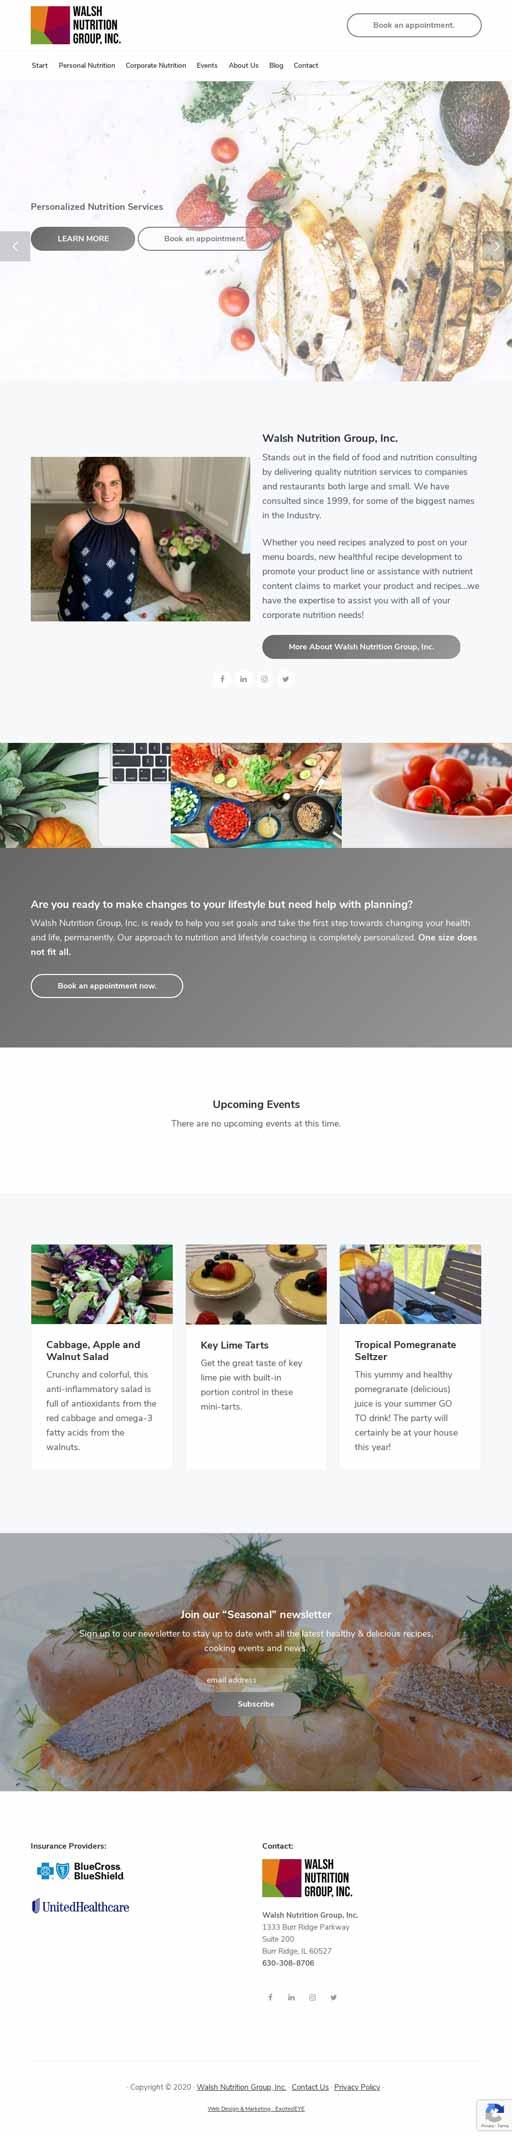 Full Front WordPress Web Design View